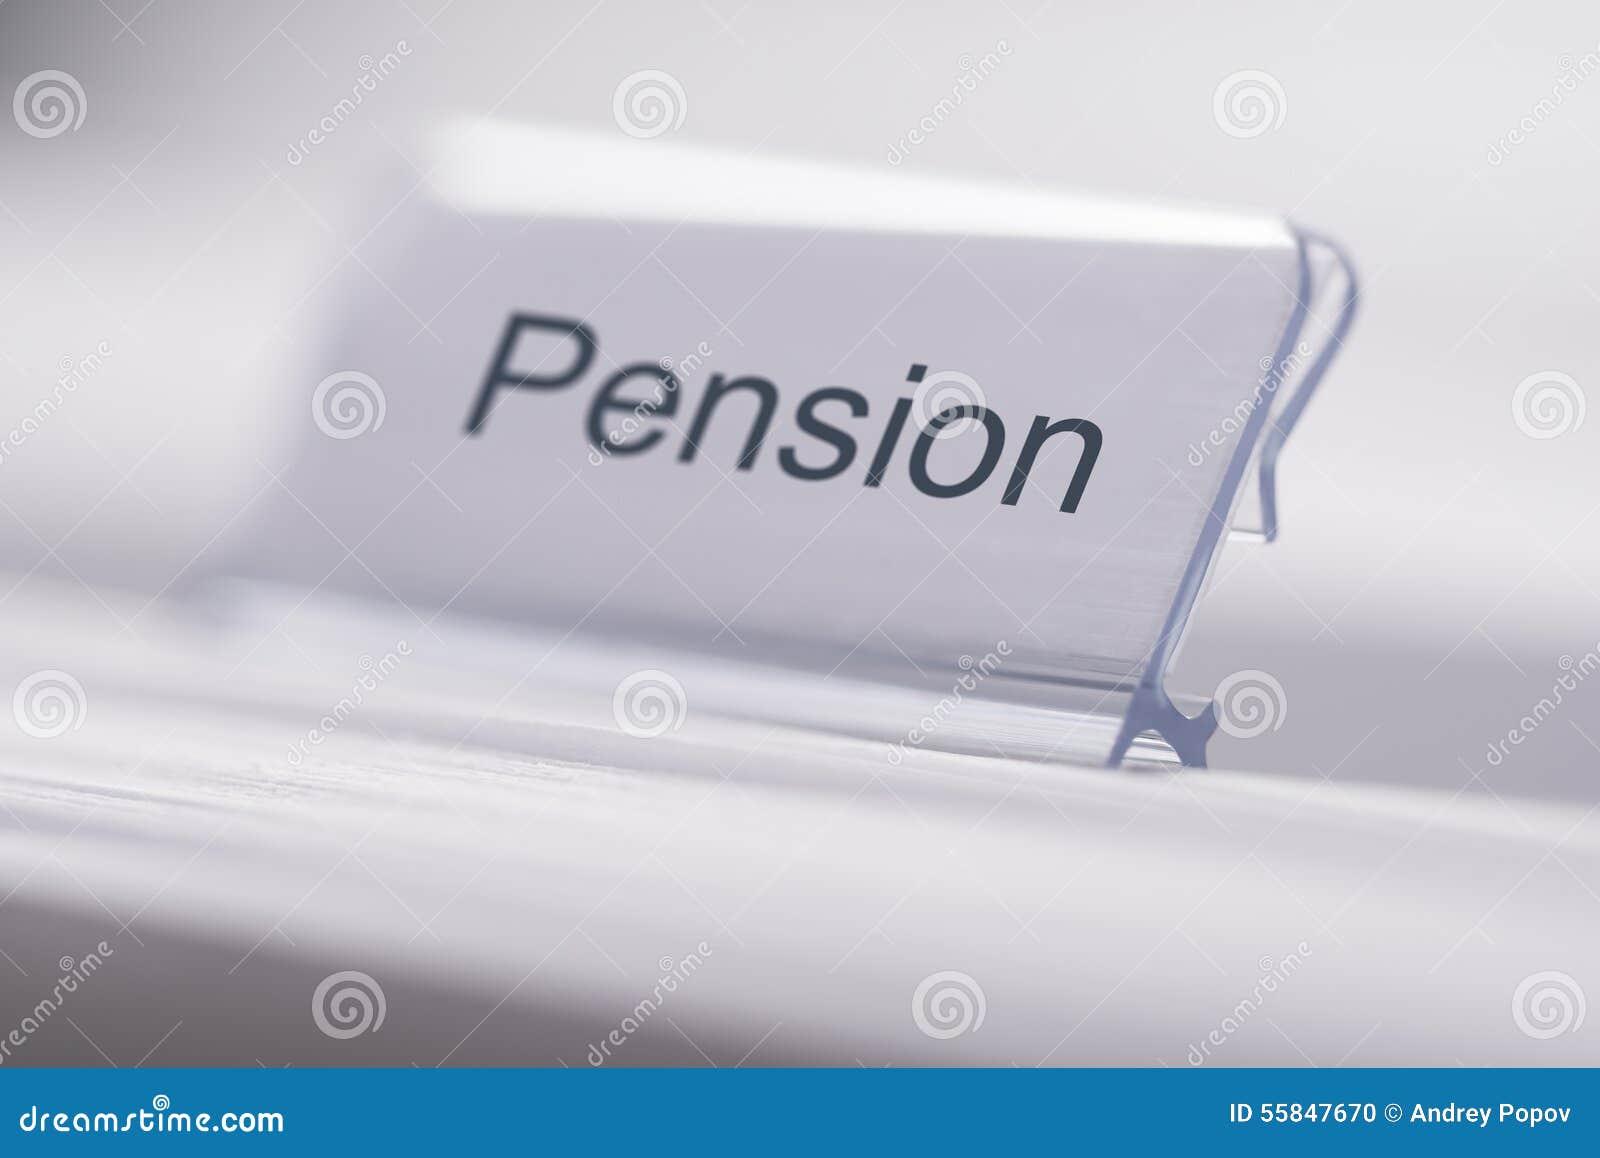 Pension Royalty-Free Stock Photography | CartoonDealer.com ...